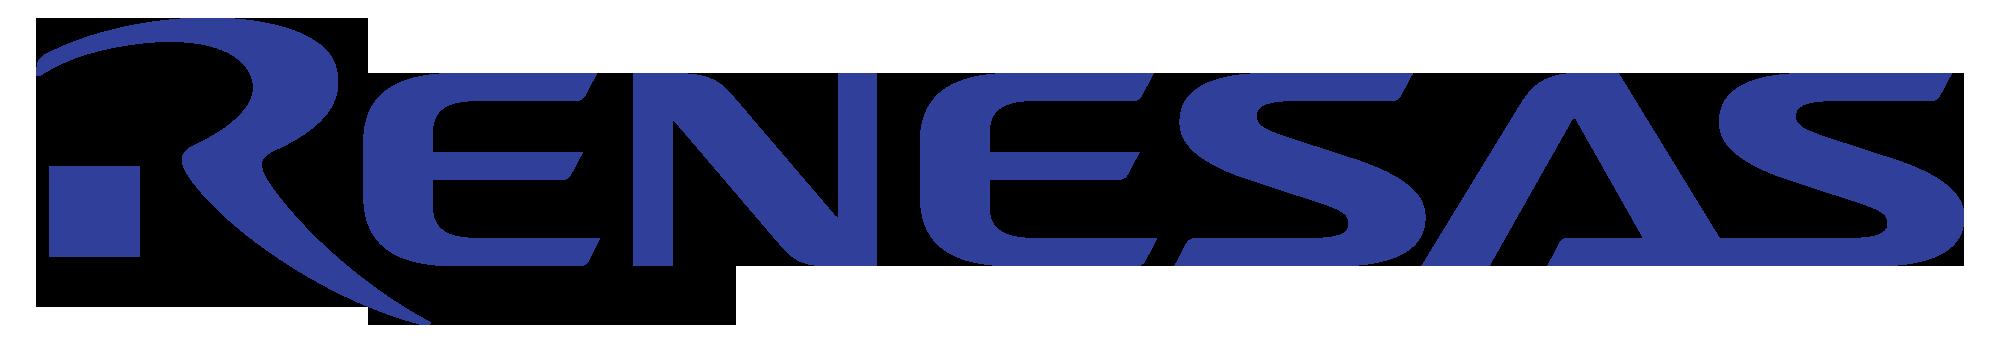 Intersil, A Renesas Company